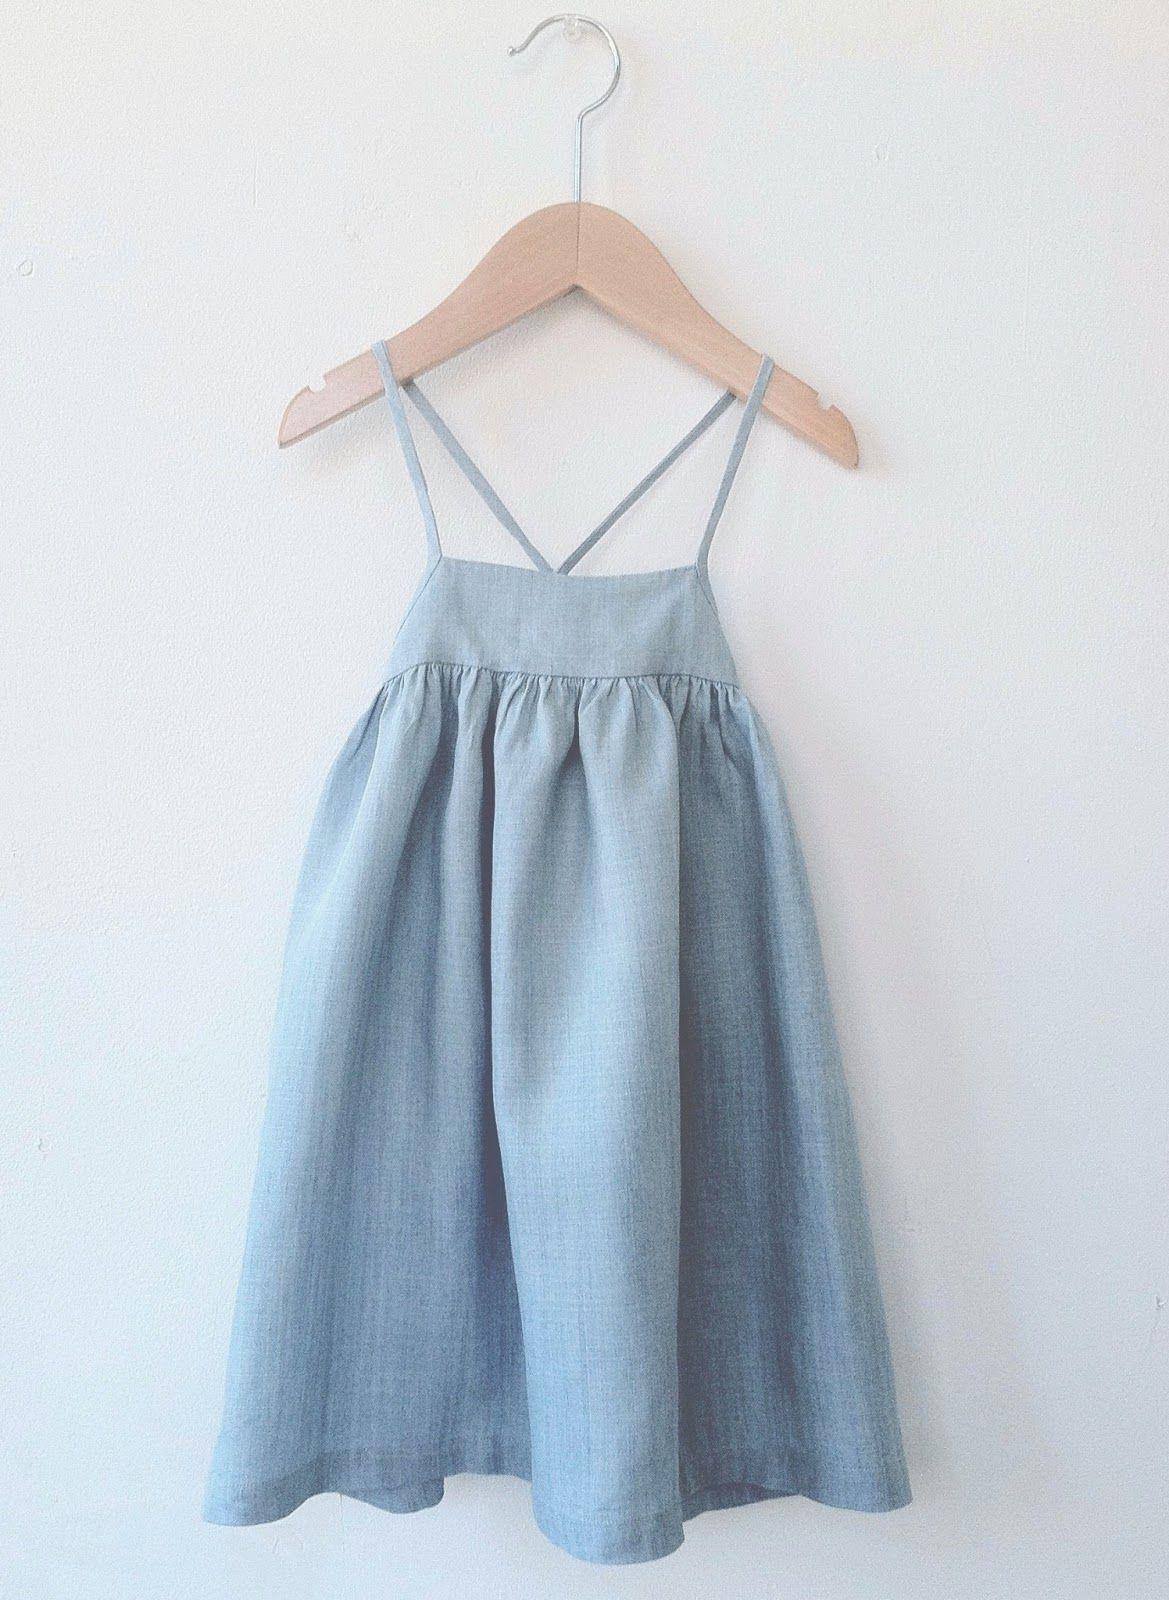 Summer Dress For Little Girls Denim Strappy Toddler Dress Little Girl Dresses Kids Outfits [ 1600 x 1169 Pixel ]